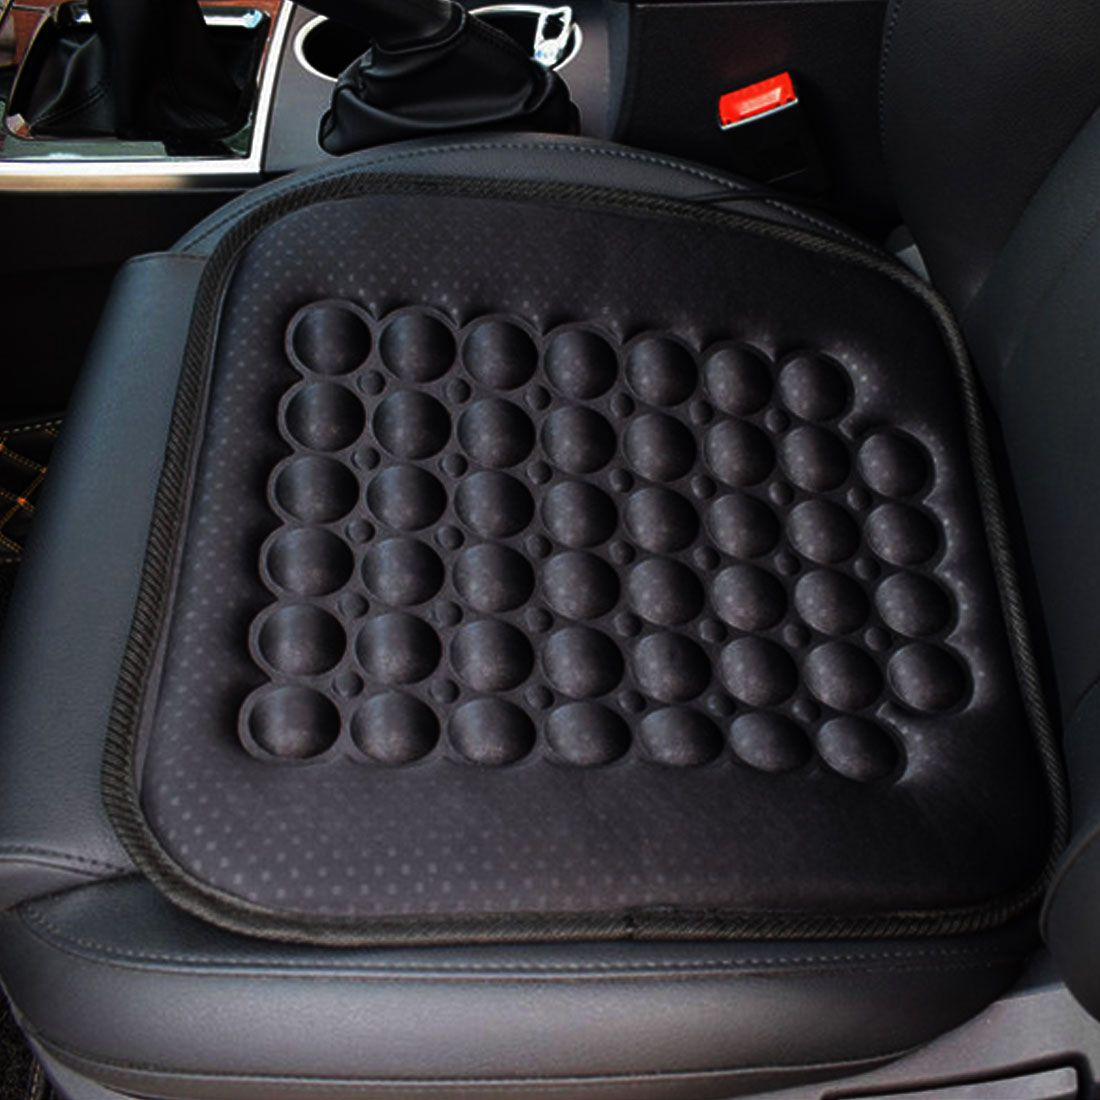 Black Car Seat Cushion Covers Full Set 5-Seats PU Leather+Flax Accessories USA